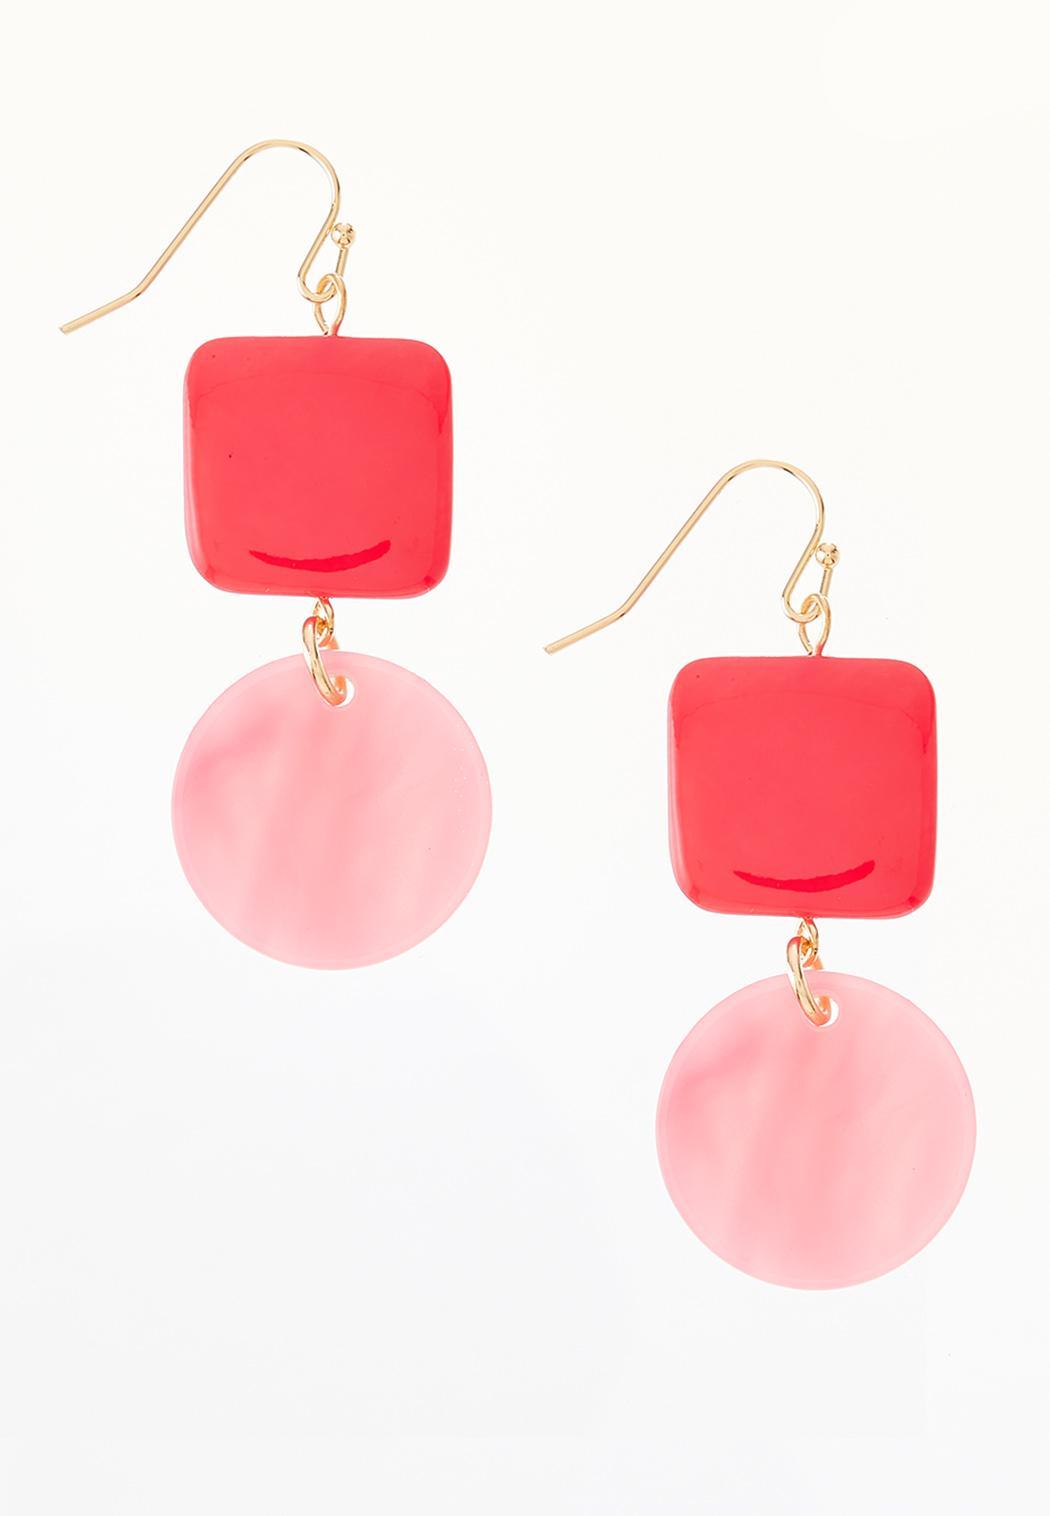 Tiered Pink Earrings